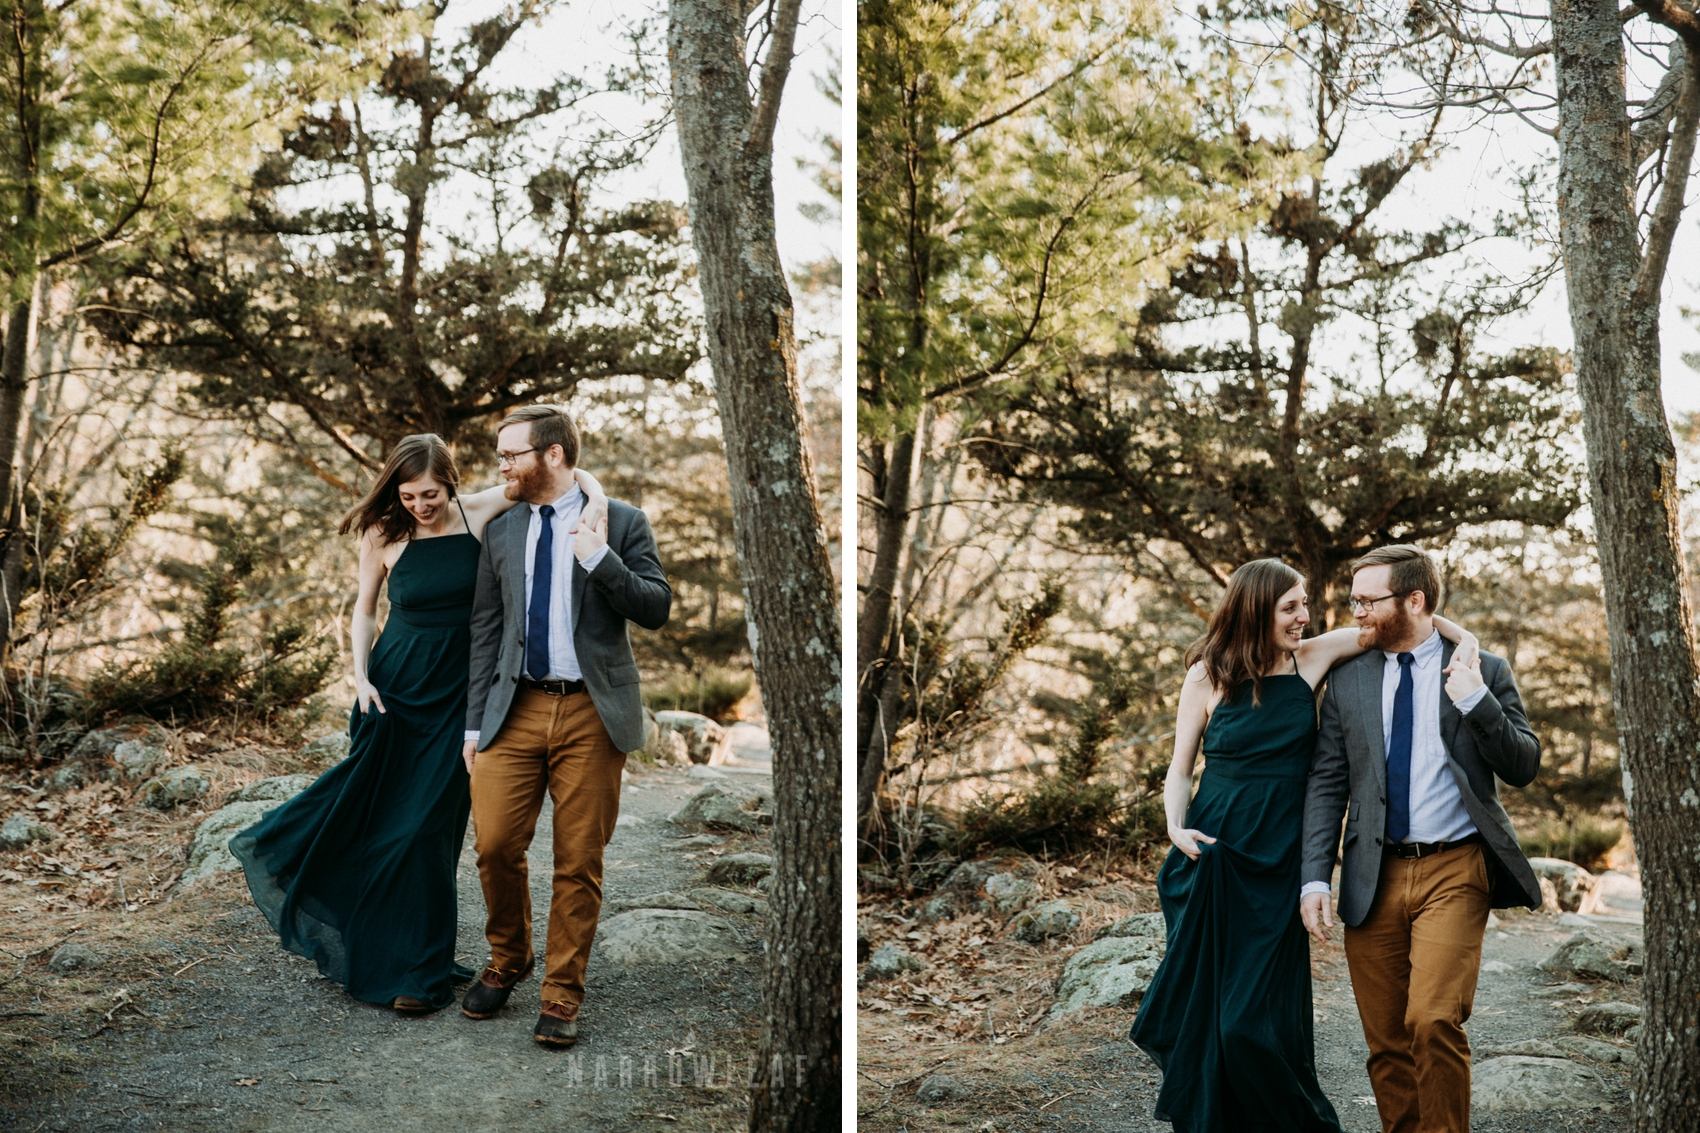 wisconsin-interstate-park-adventure-wedding-elopement-NarrowLeaf-Photography-006.jpg